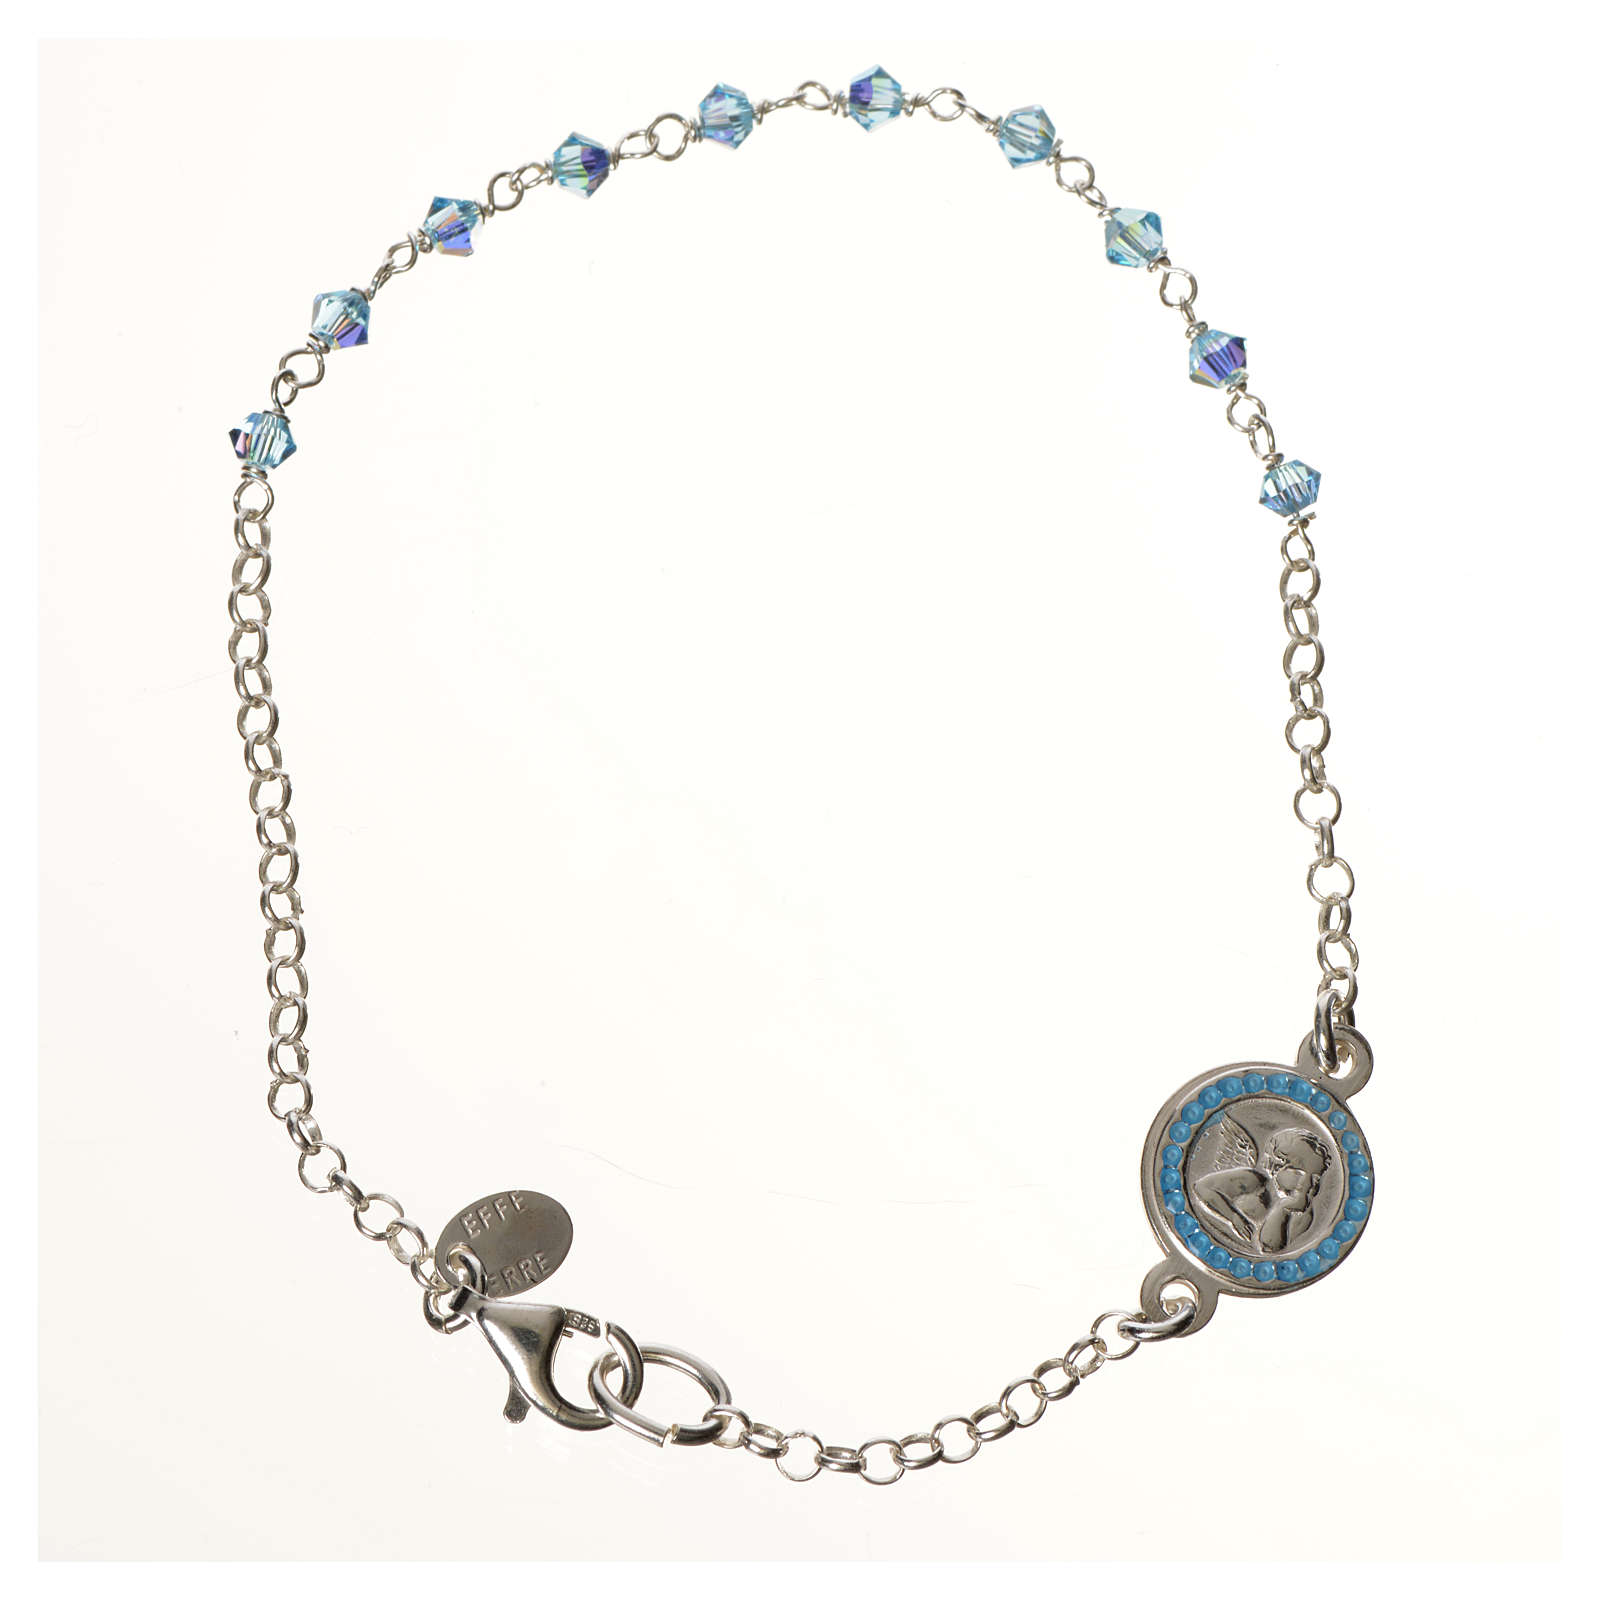 Bracelet argent 800 Swarovski bleus Ange Gardien 4